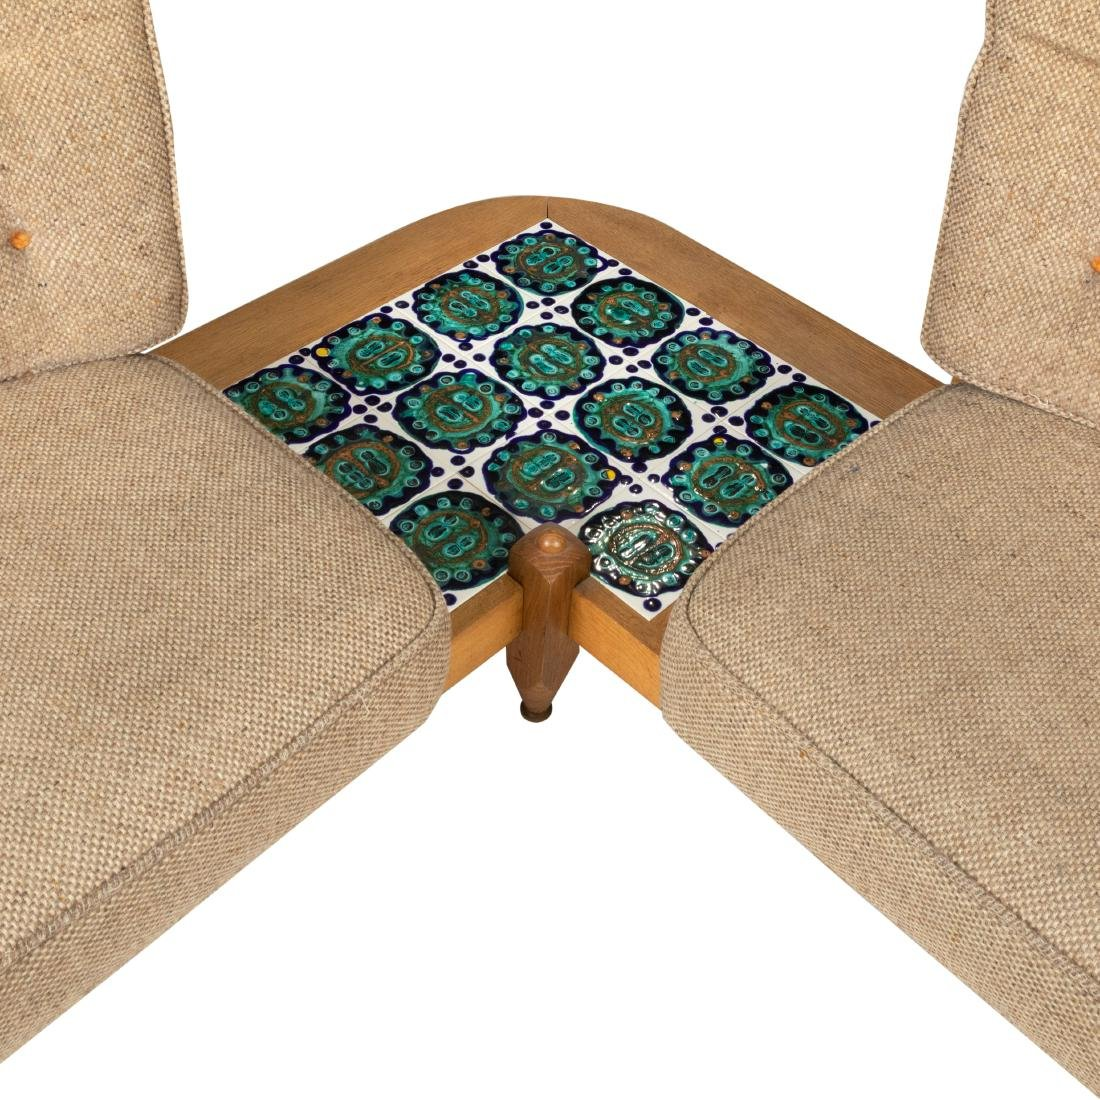 Guillerme & Chambron - Corner Sofa - 3